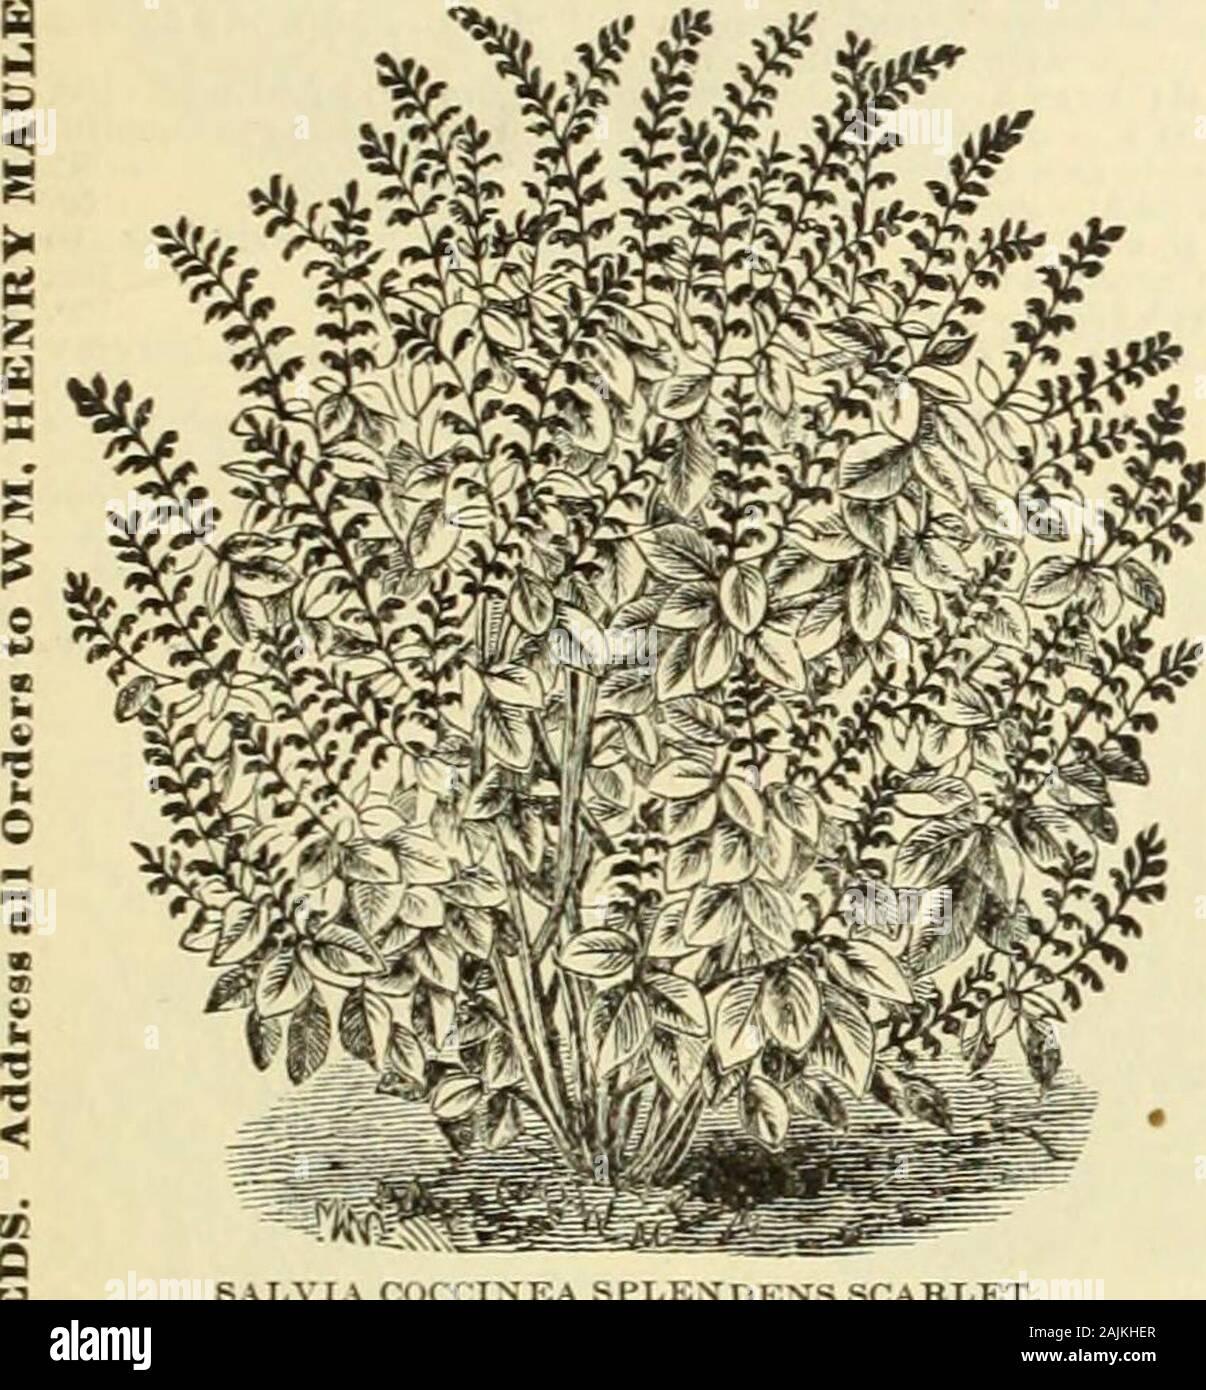 Maule's seed catalogue : 1896 . -Fou. 1 1^^^ ?I l^^s 1 ^^^^S 1 ^^^g t ^^I^Sw aj ^^^^^^m ^^^P^^ ^Sm^KSbM^^ ^^ STC.KKS—GERMAN —IKN W 1 fKS  Stock Photo